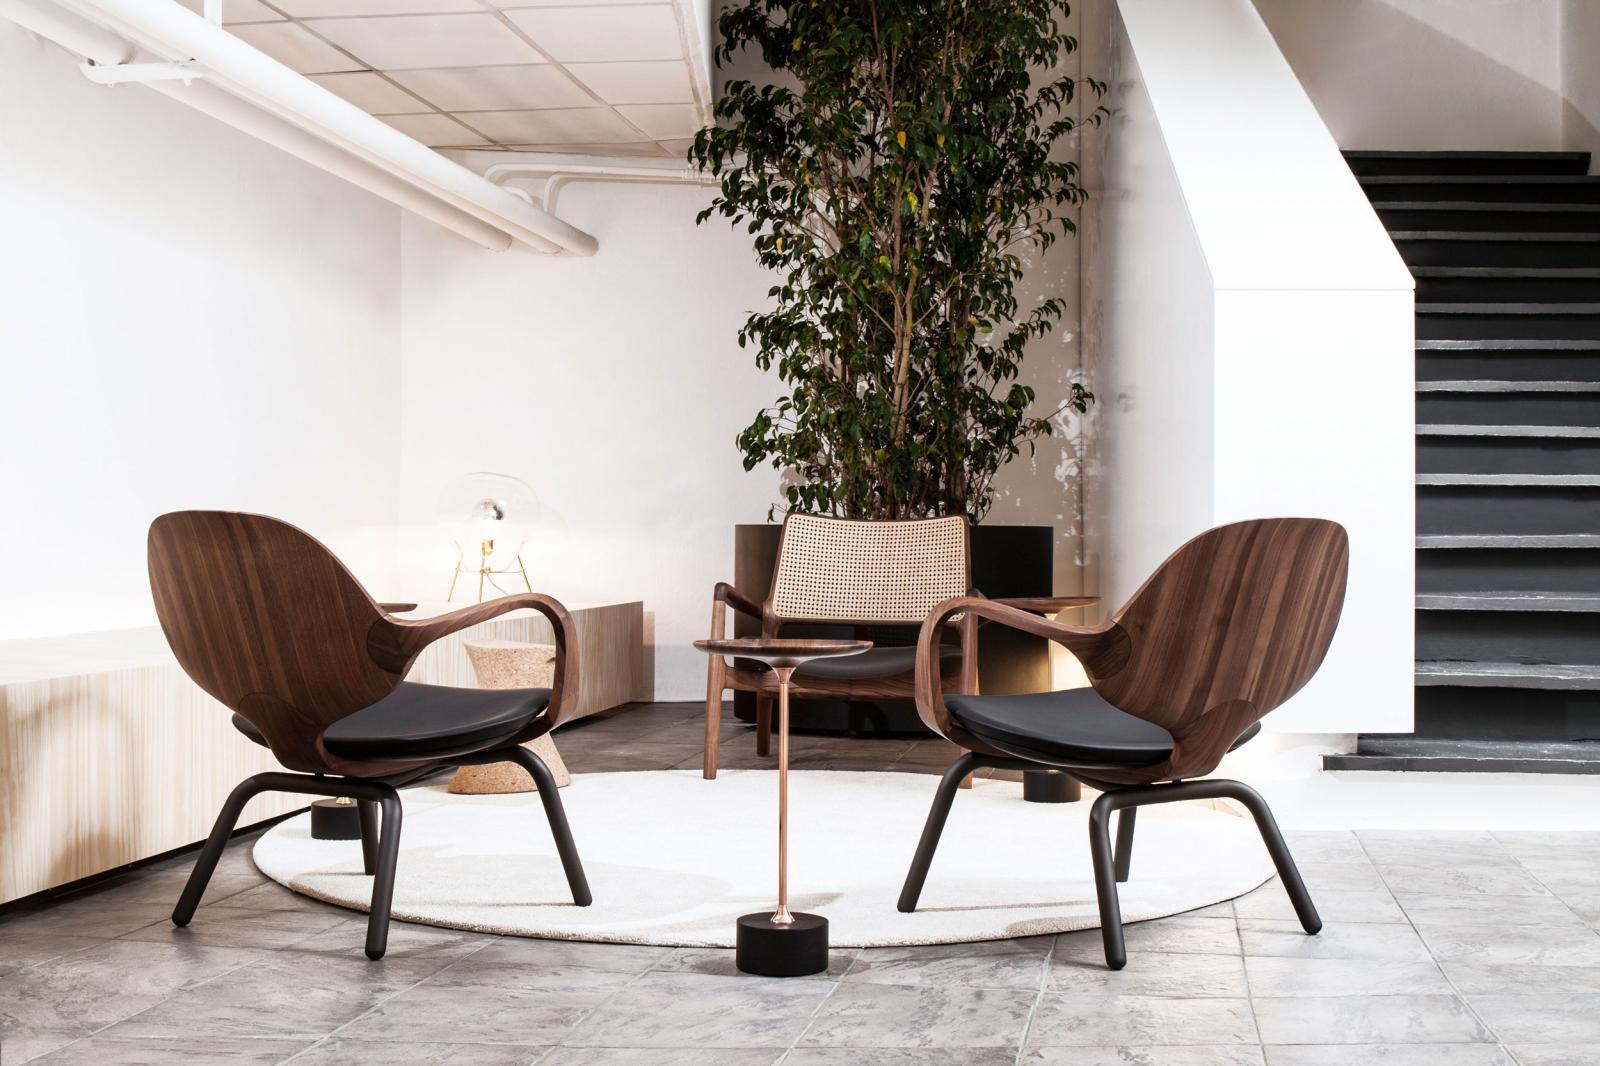 Milan Design 2017 - Jader Almeida - Poltrona Clad e Mesa Lataral Jardim